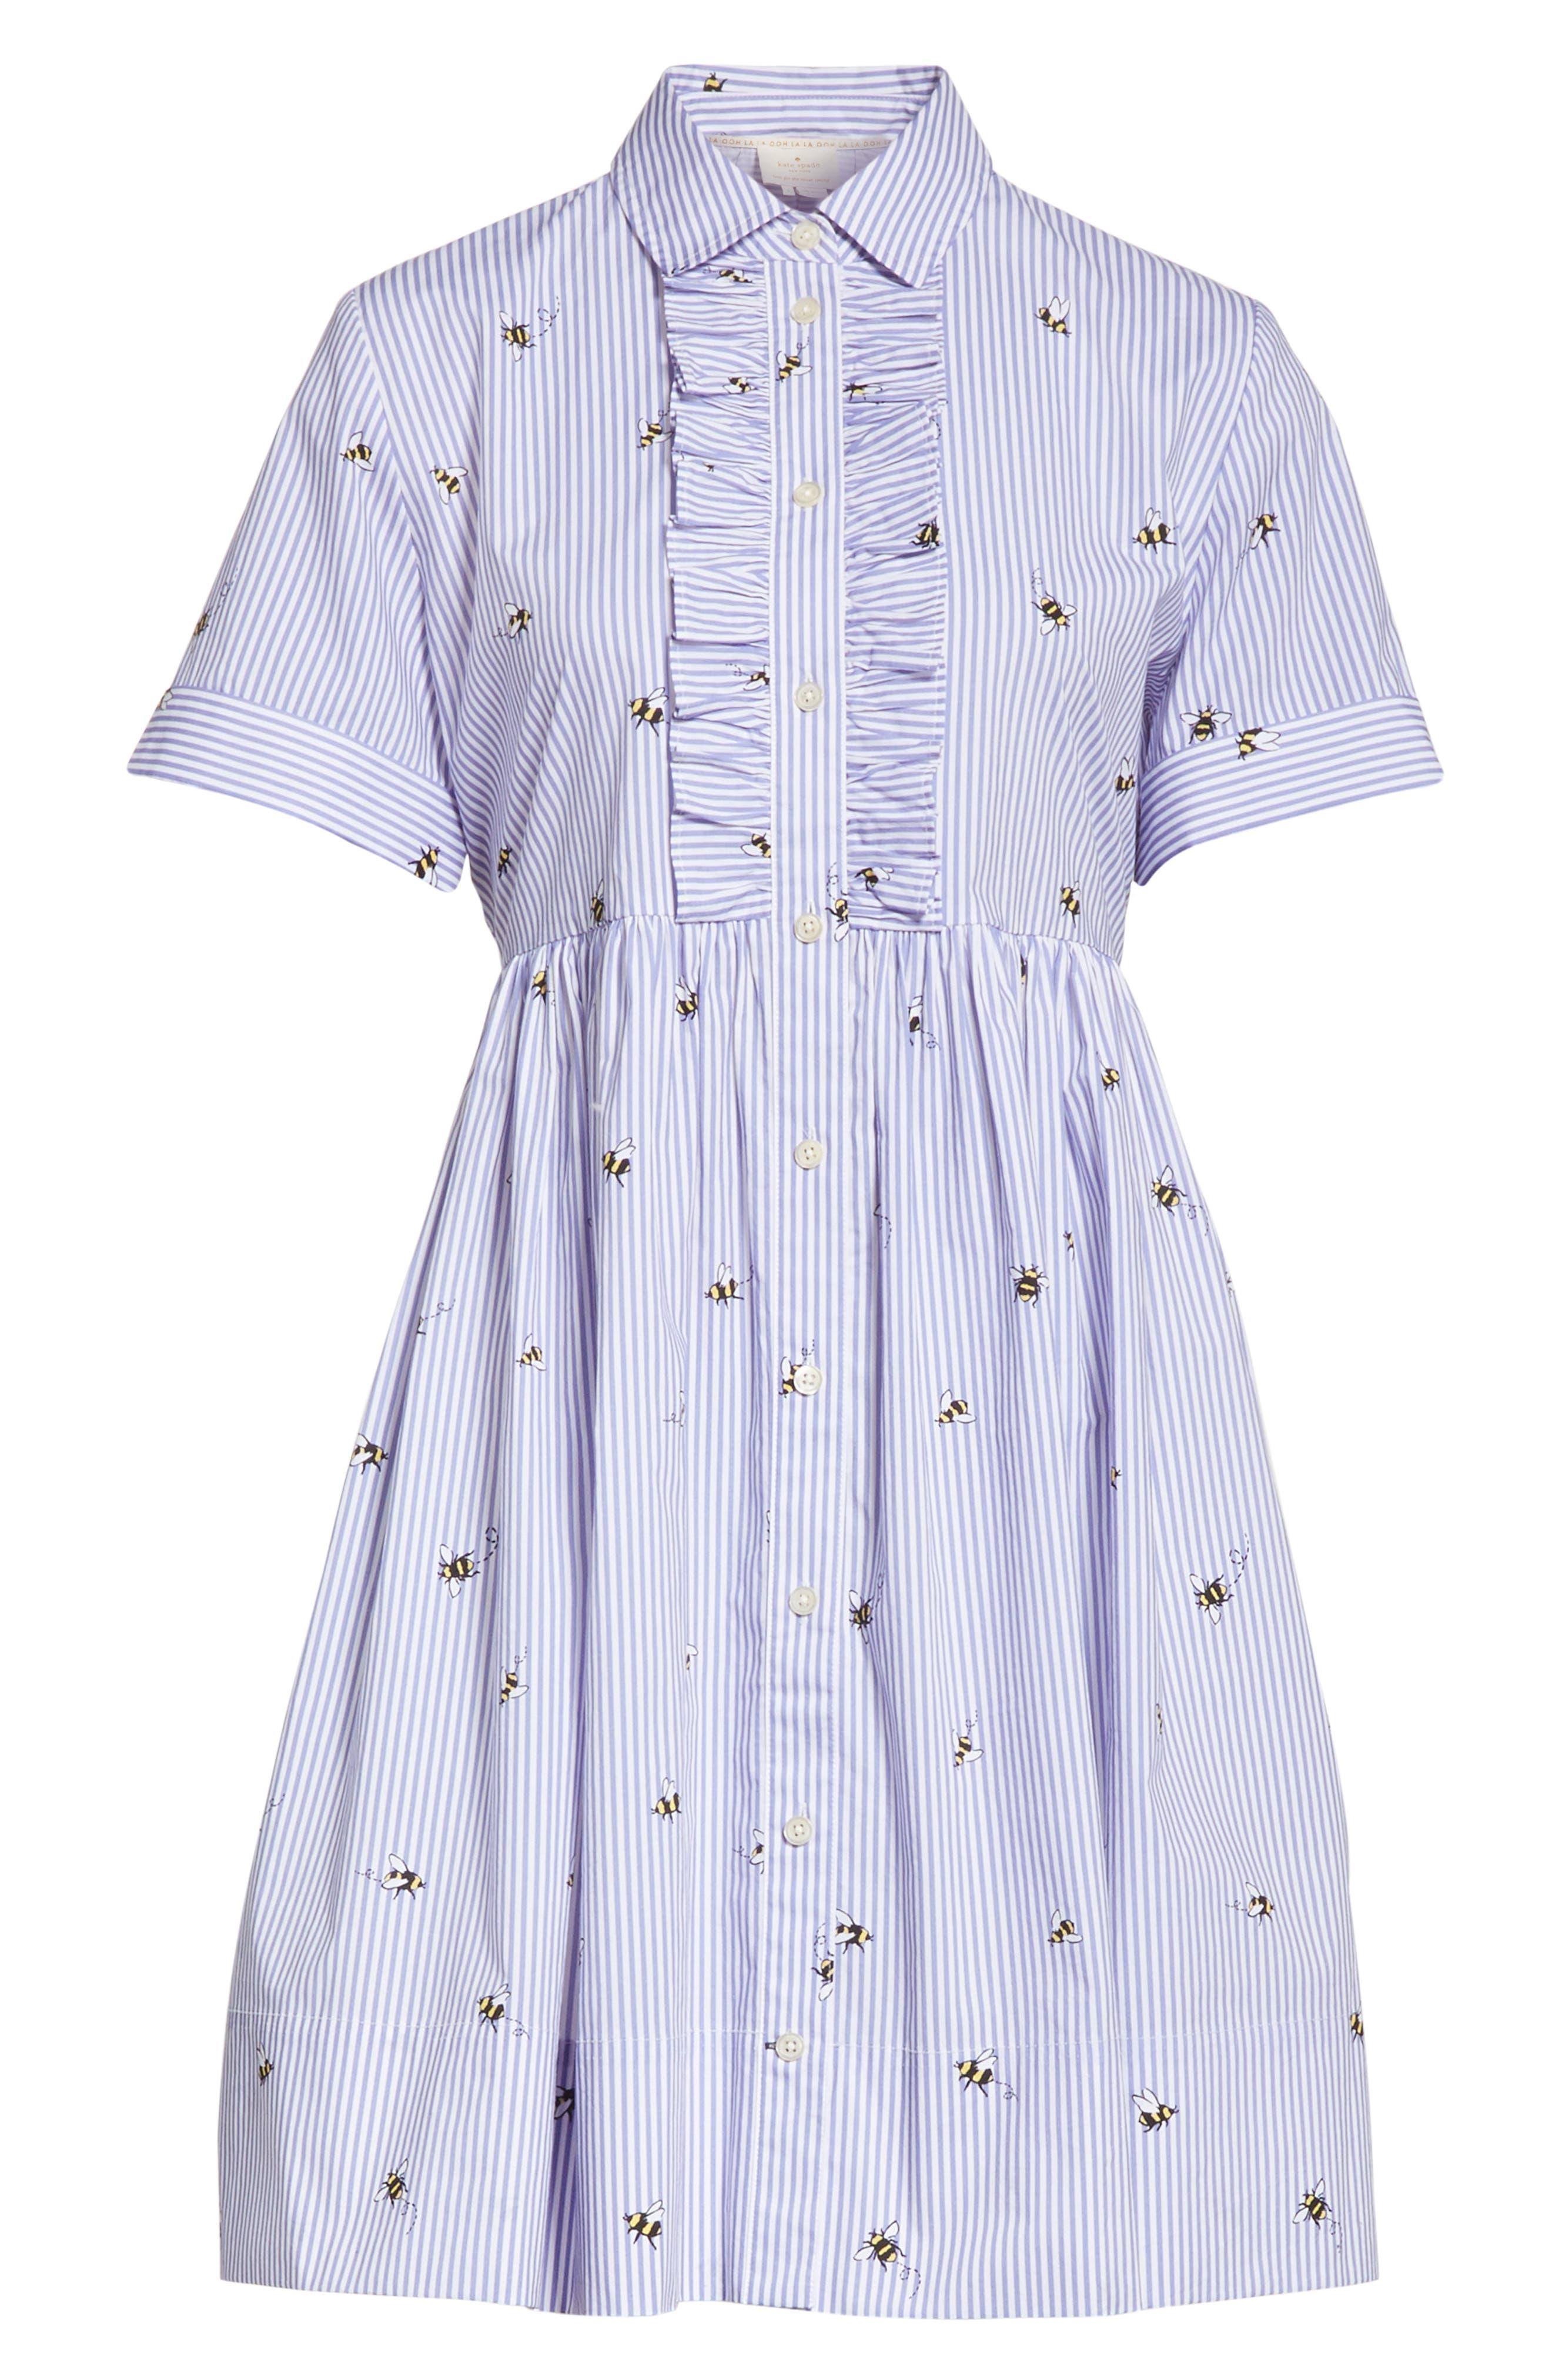 abuzz poplin shirtdress,                             Alternate thumbnail 6, color,                             Fresh White/ Rich Lapis